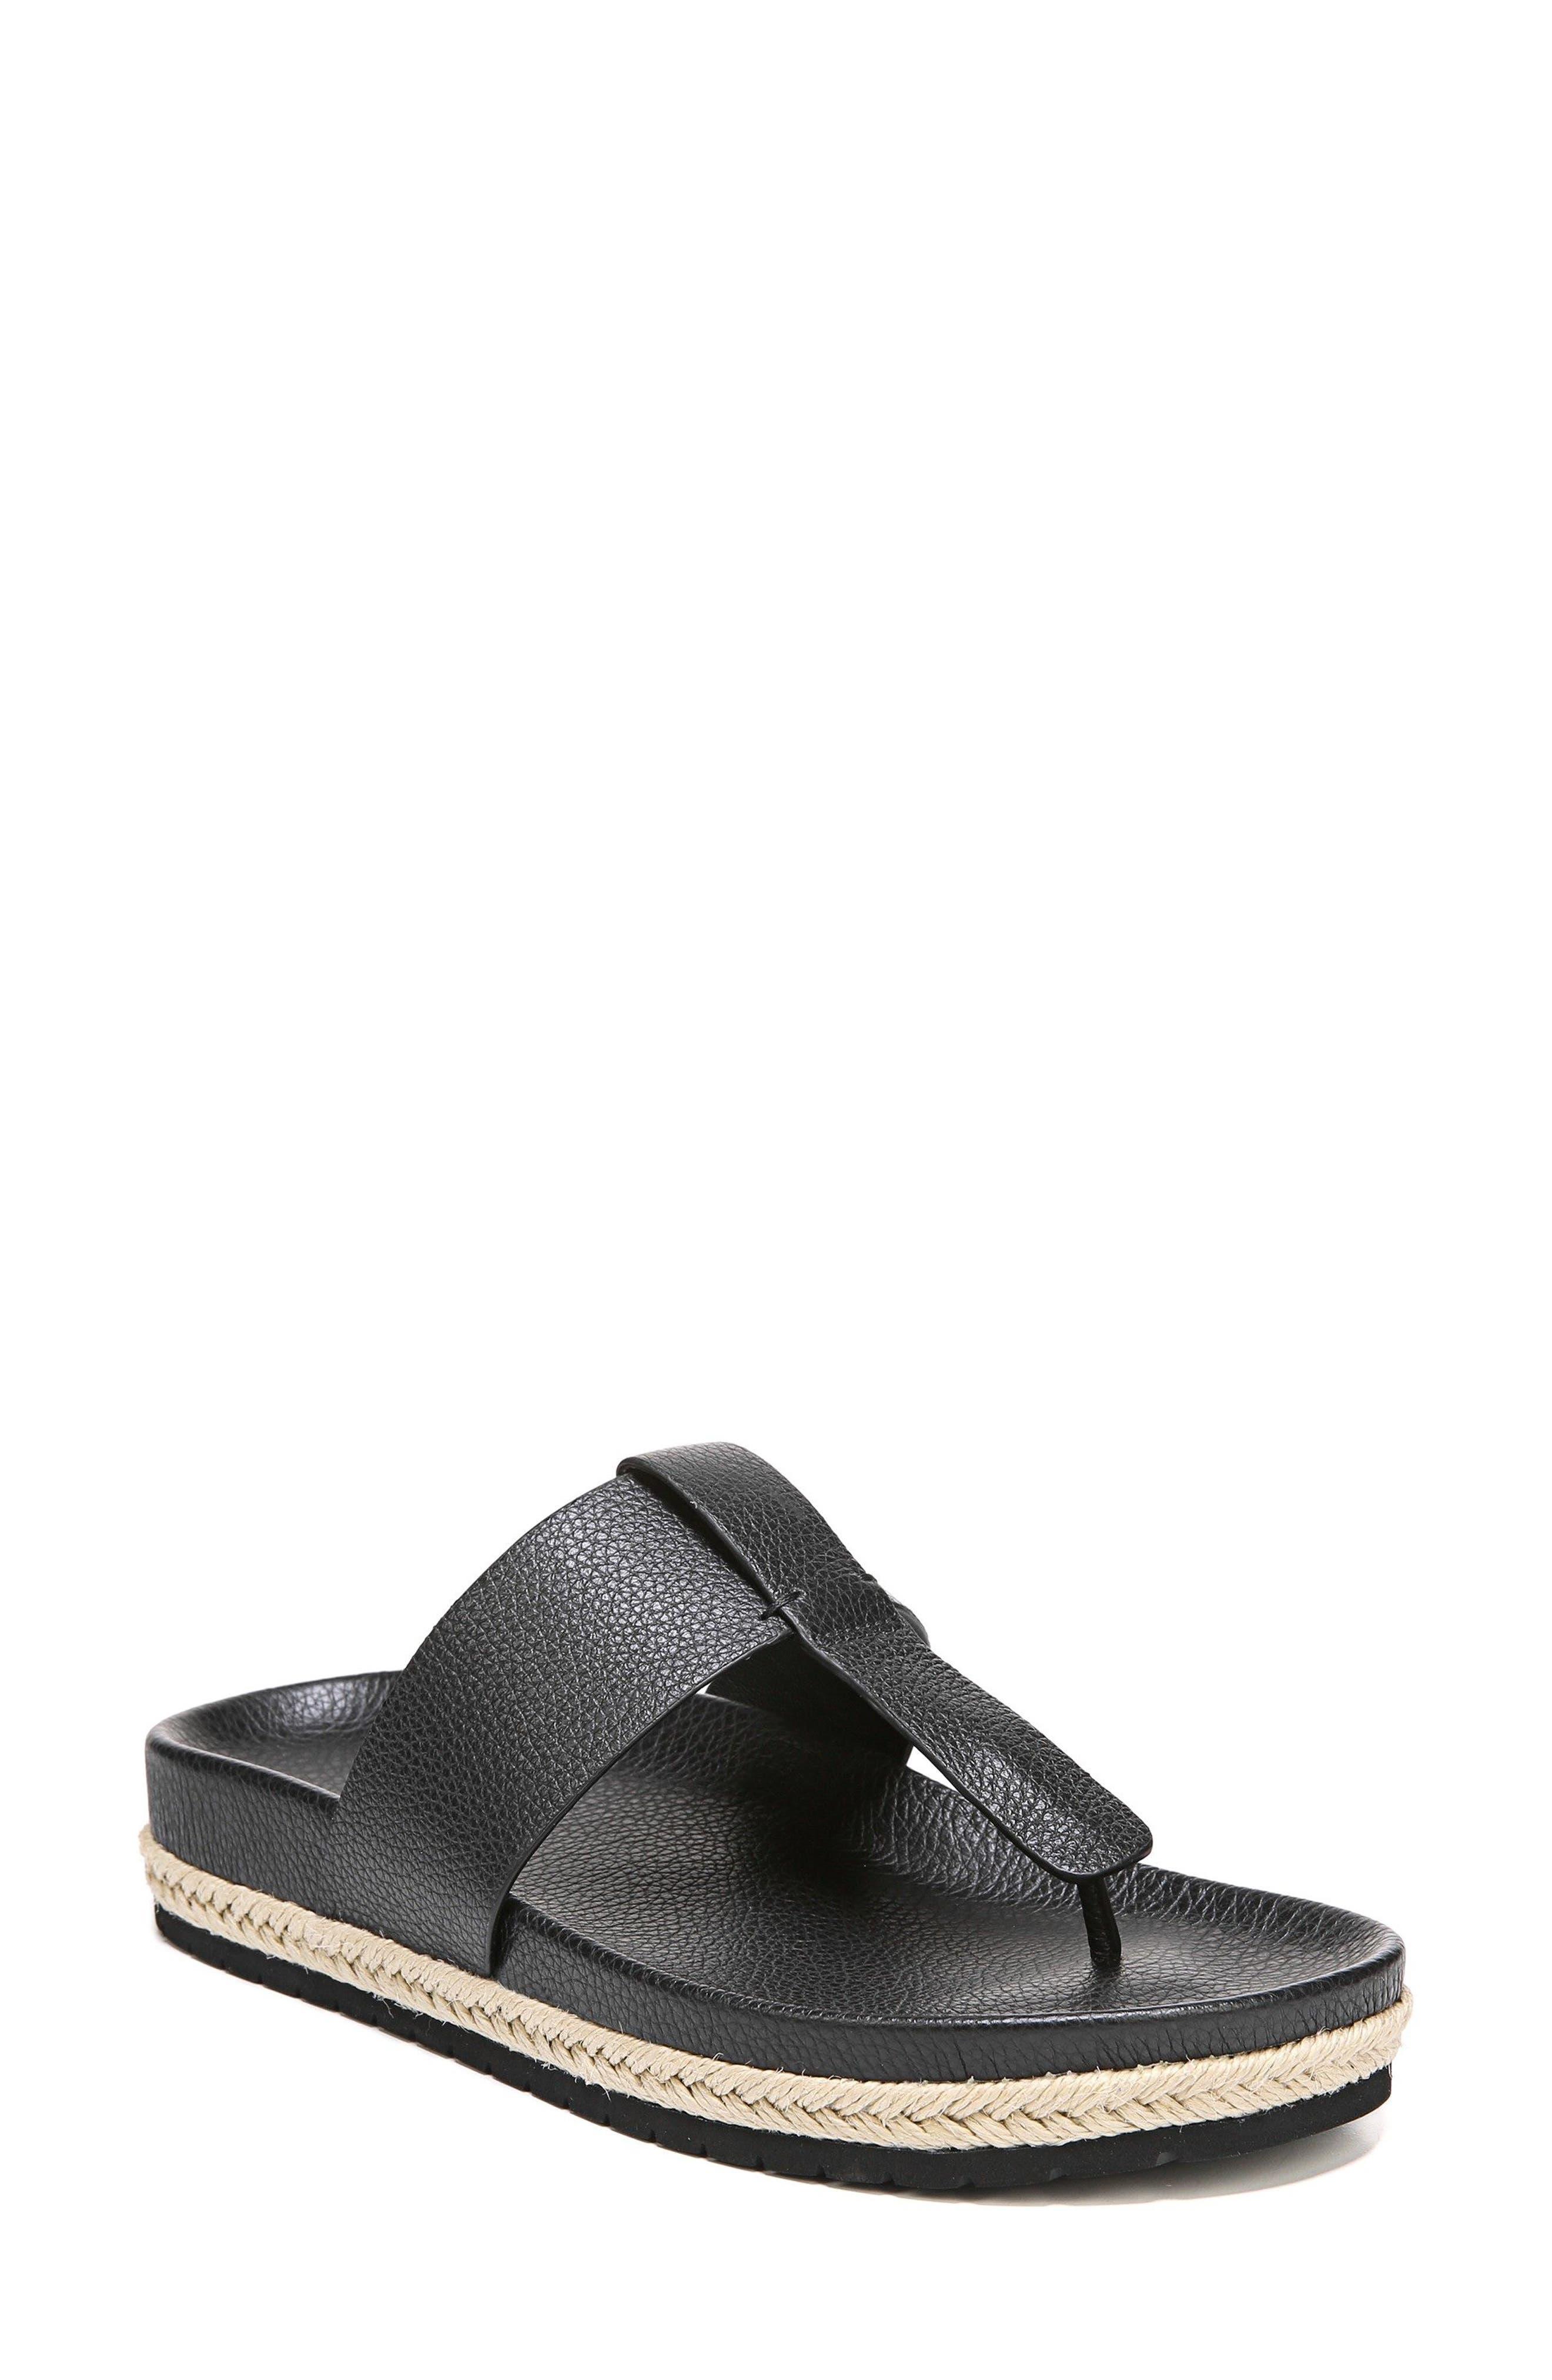 Avani T-Strap Flat Sandal,                         Main,                         color,